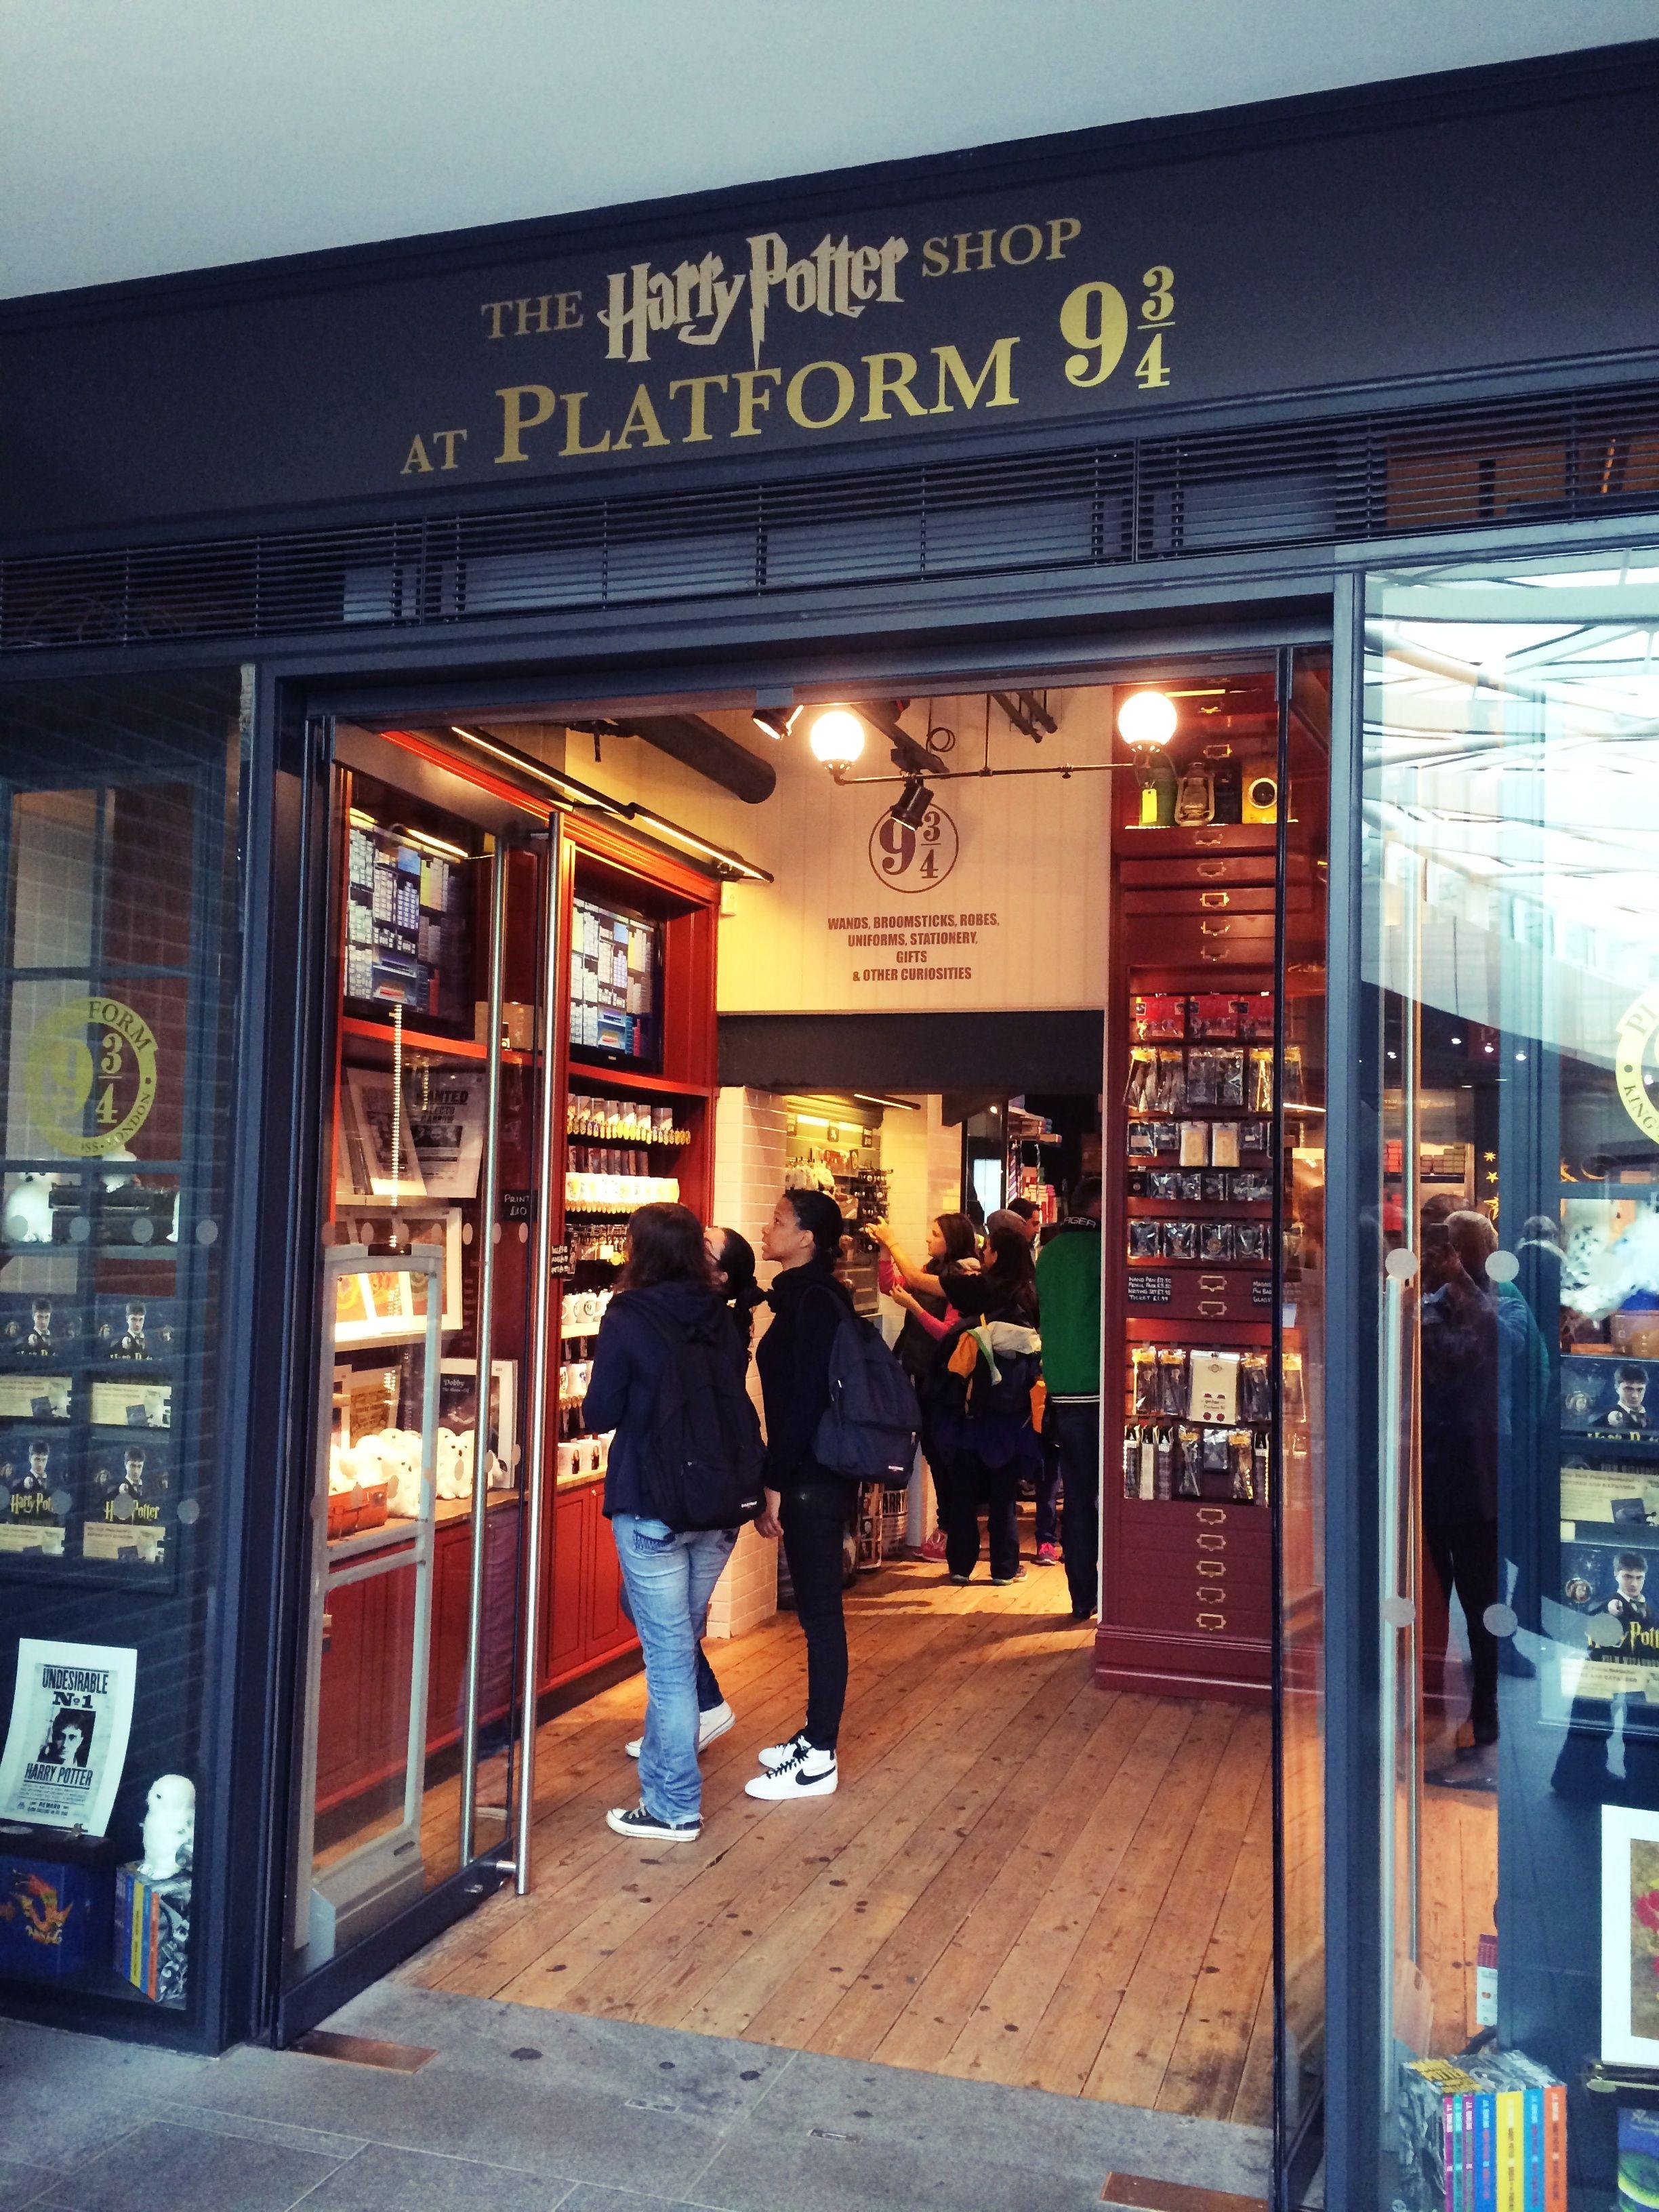 Harry potter shop harry potter shop shopping broadway